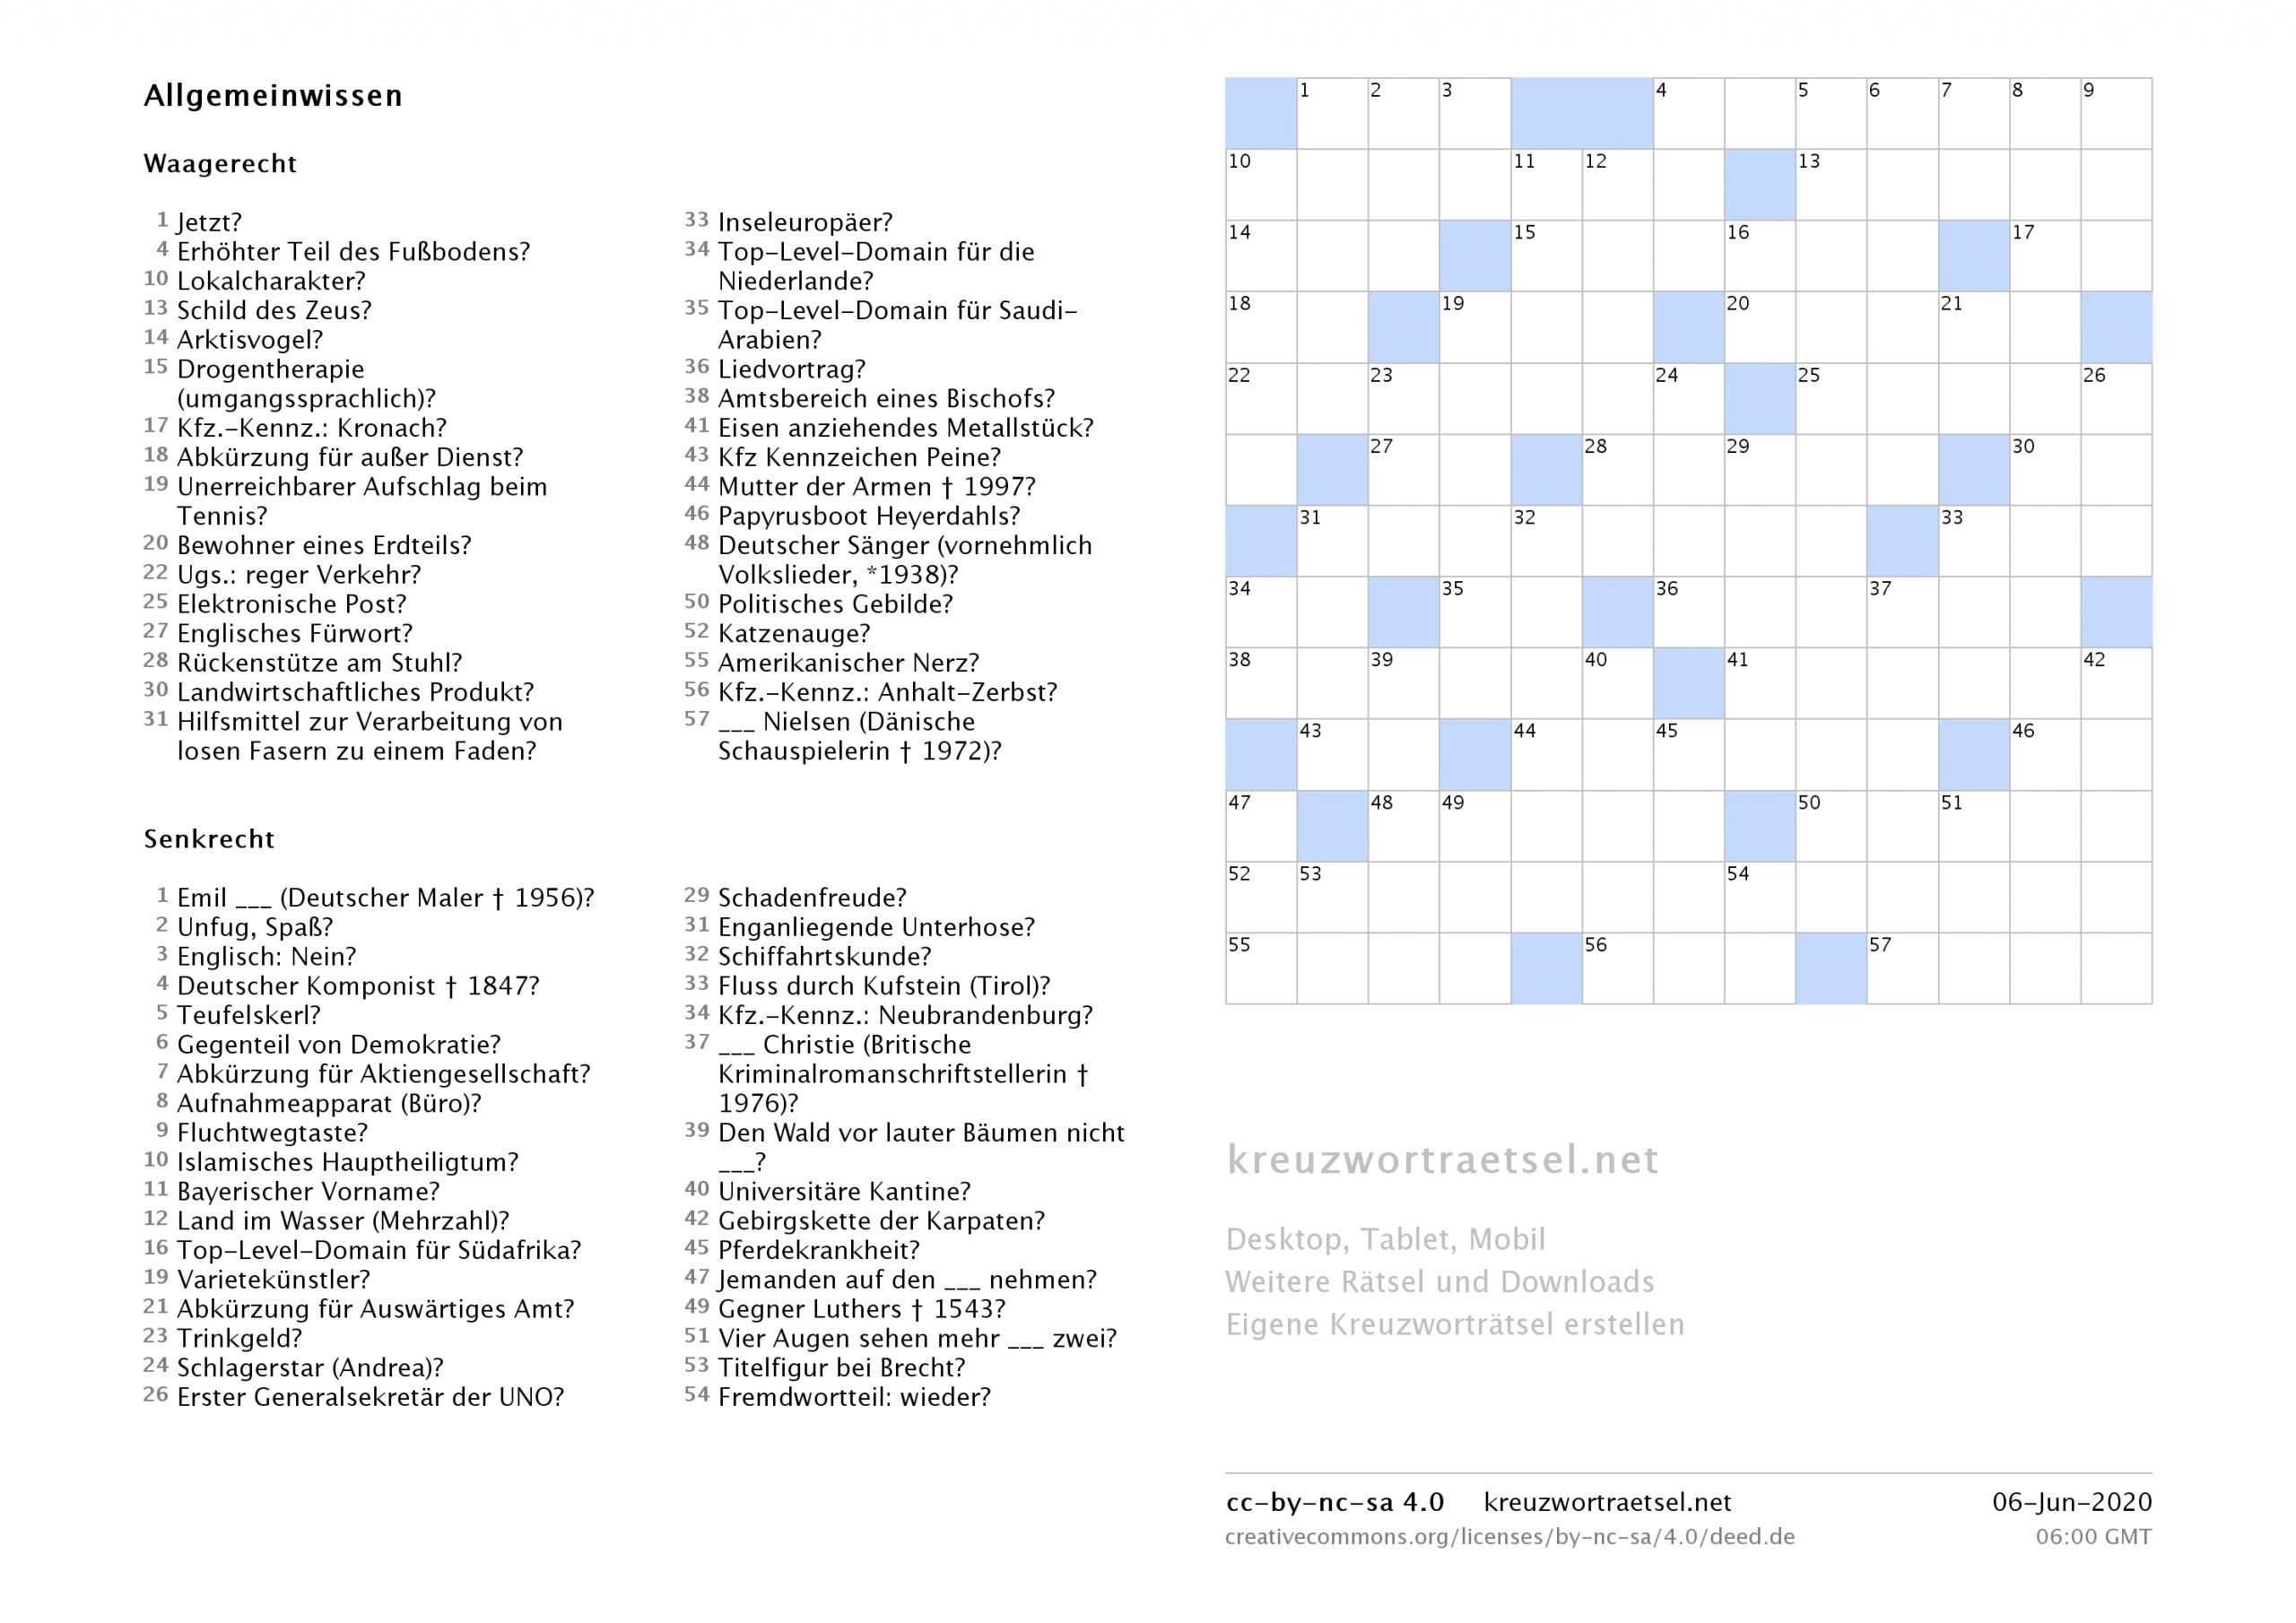 Kreuzworträtsel Zum Ausdrucken  Kreuzworträtsel über Bild Kreuzwortraetsel